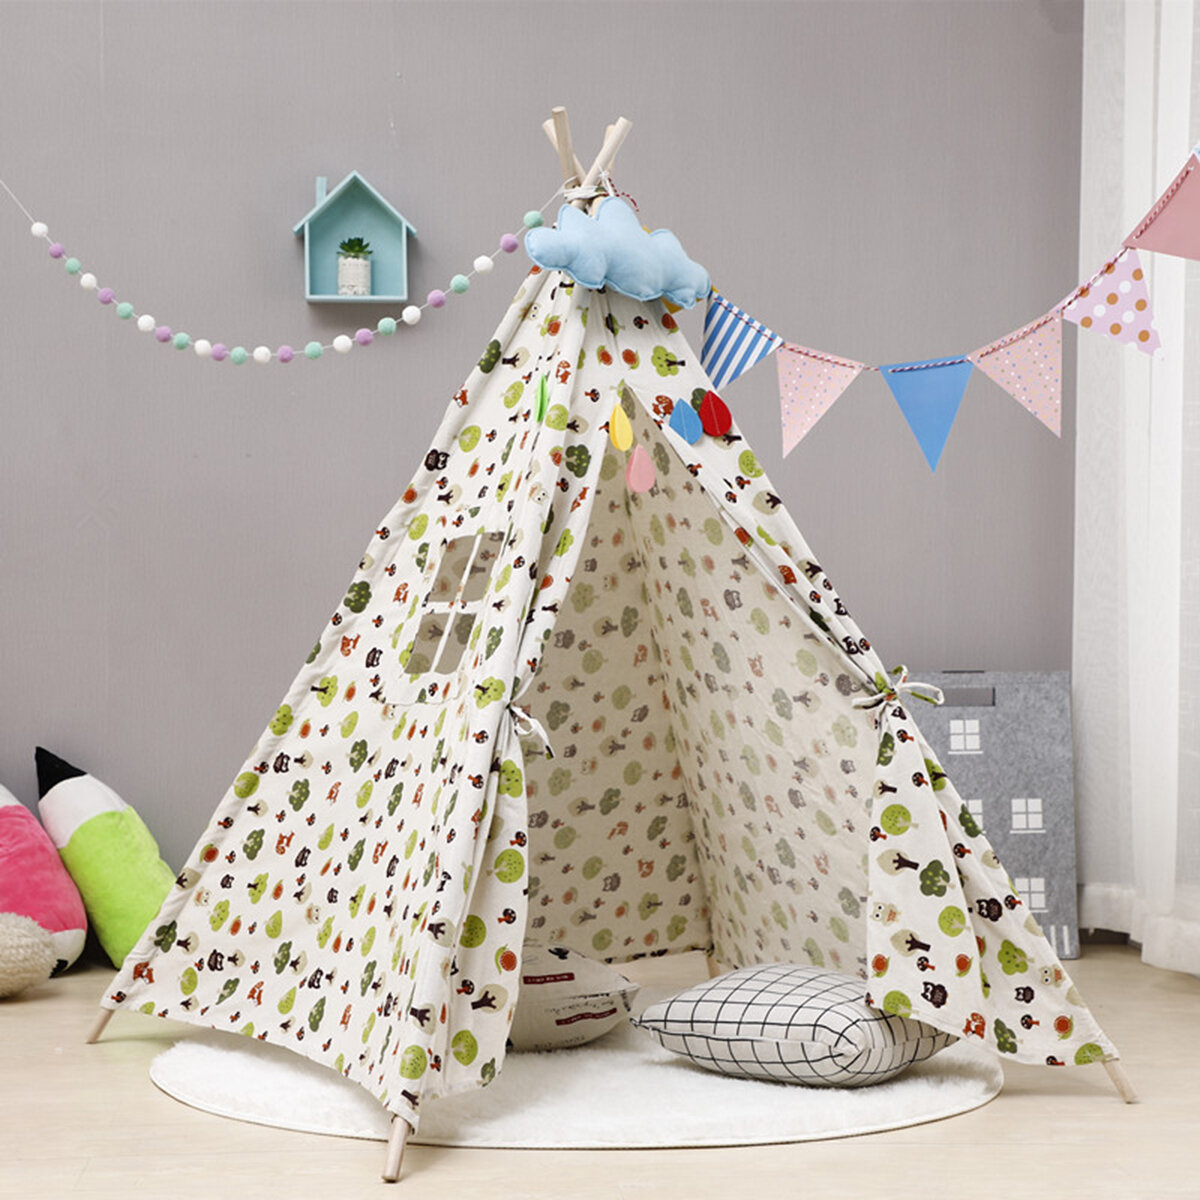 Kingso Indoor Fabric Triangular Play Tent With Carrying Bag Reviews Wayfair